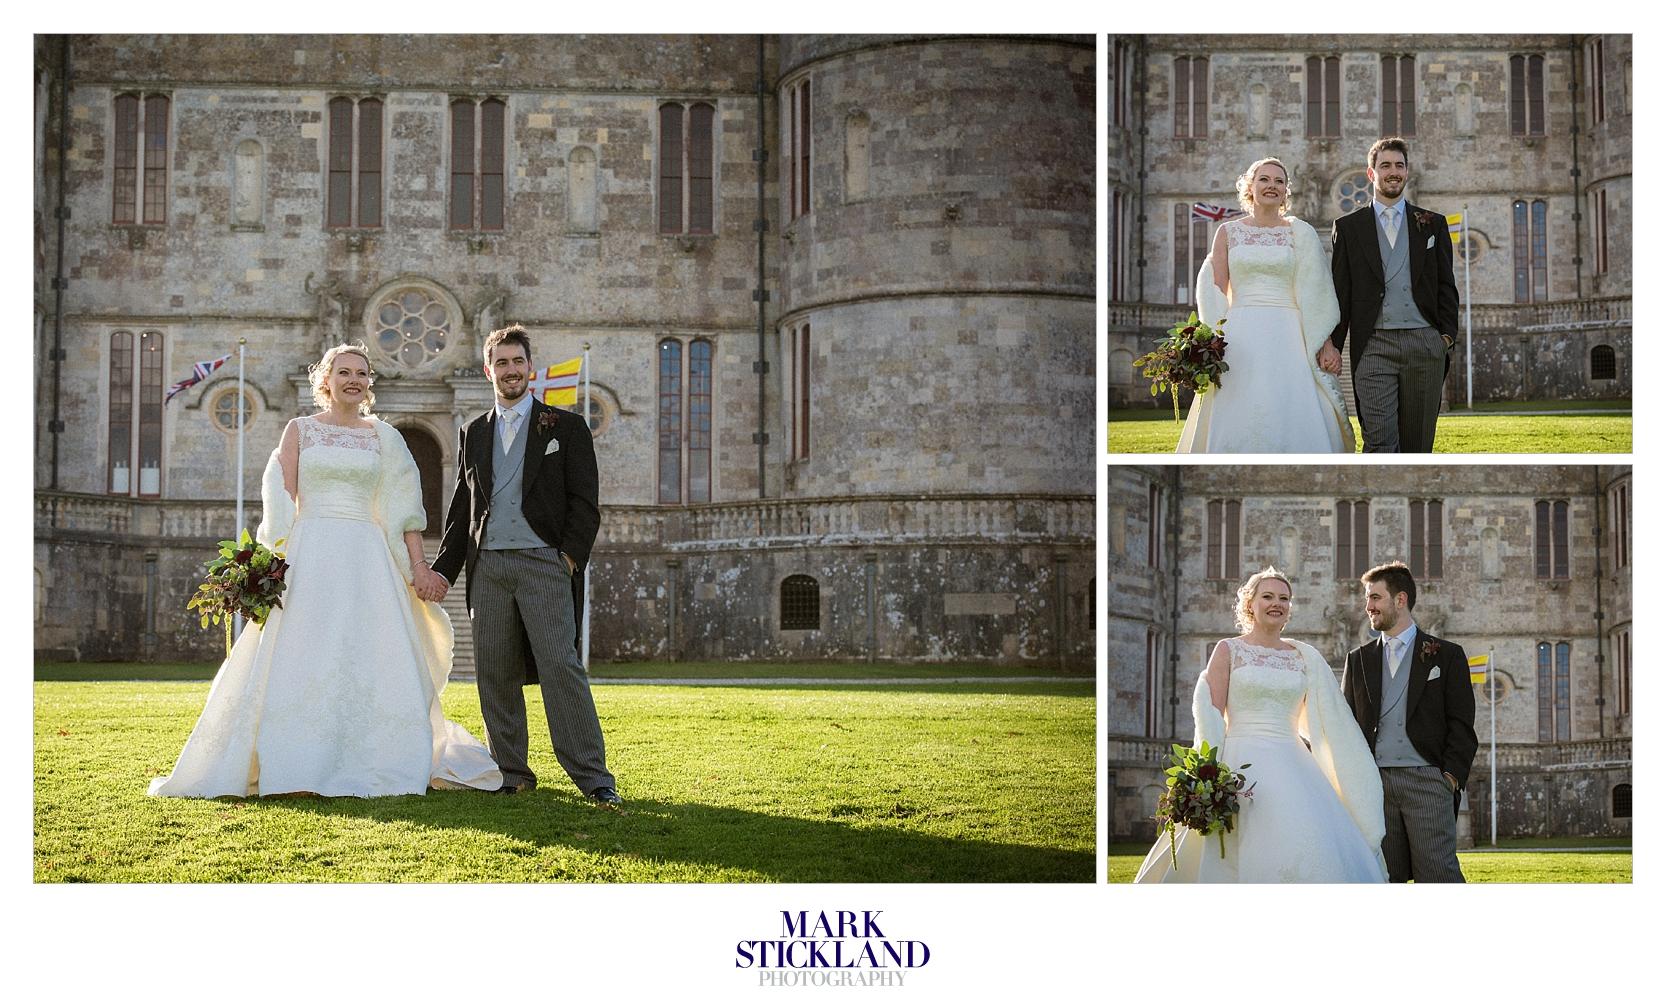 lulworth_castle_wedding_dorset_mark stickland photography.22